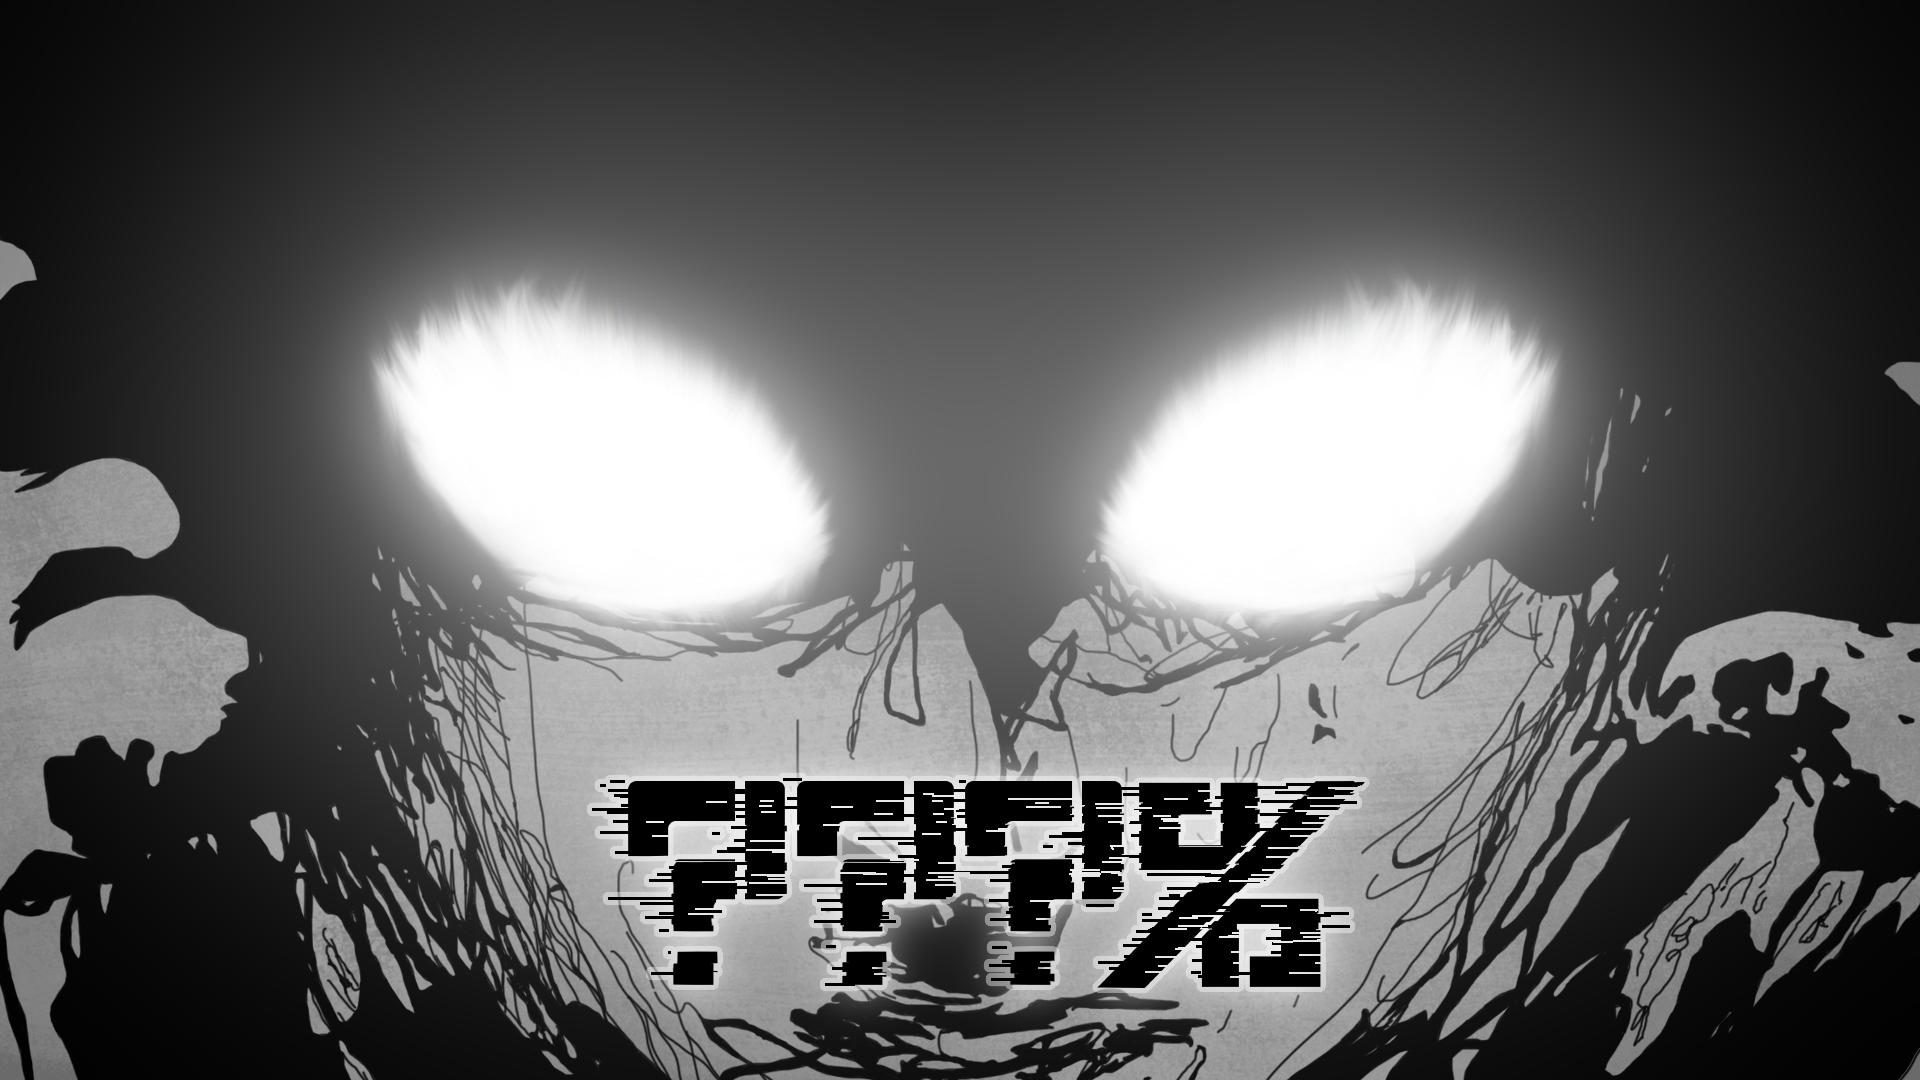 Wallpaper Mob Psycho 100 Anime 1920x1080 Mrdexterito 1157826